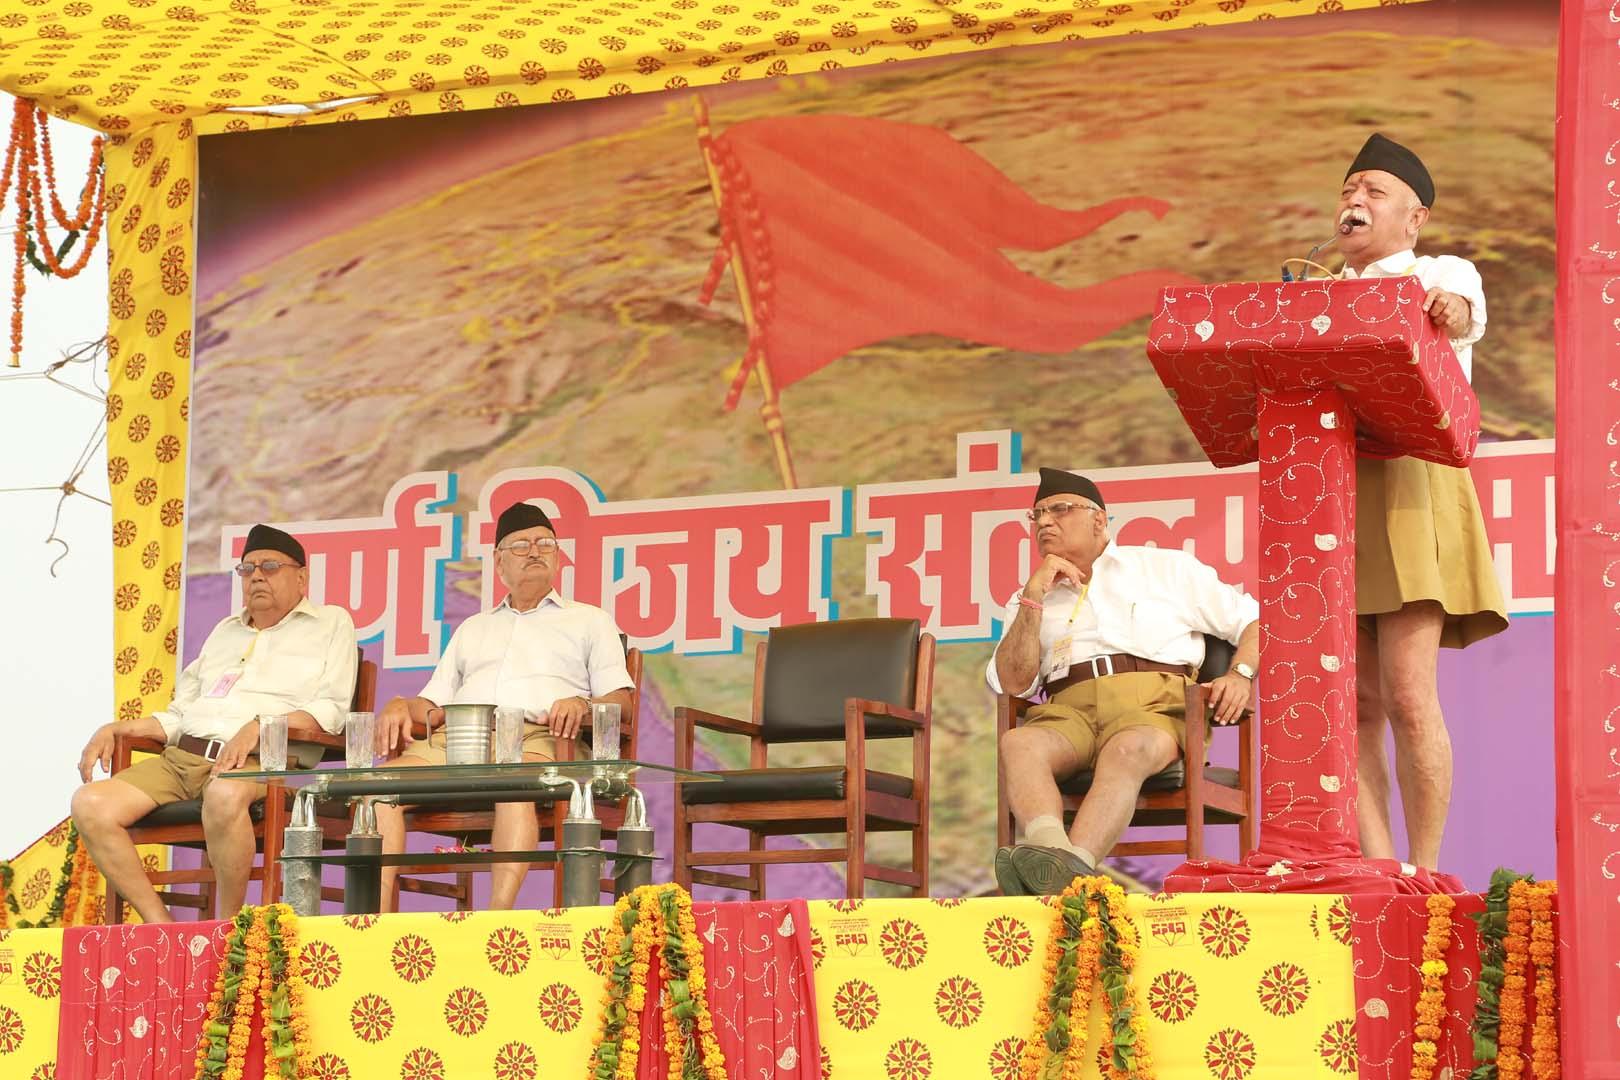 RSS Sarasanghachalak Mohan Bhagwat addressing the valedictory of Yuva Sankalp Shivir at Agra on Monday